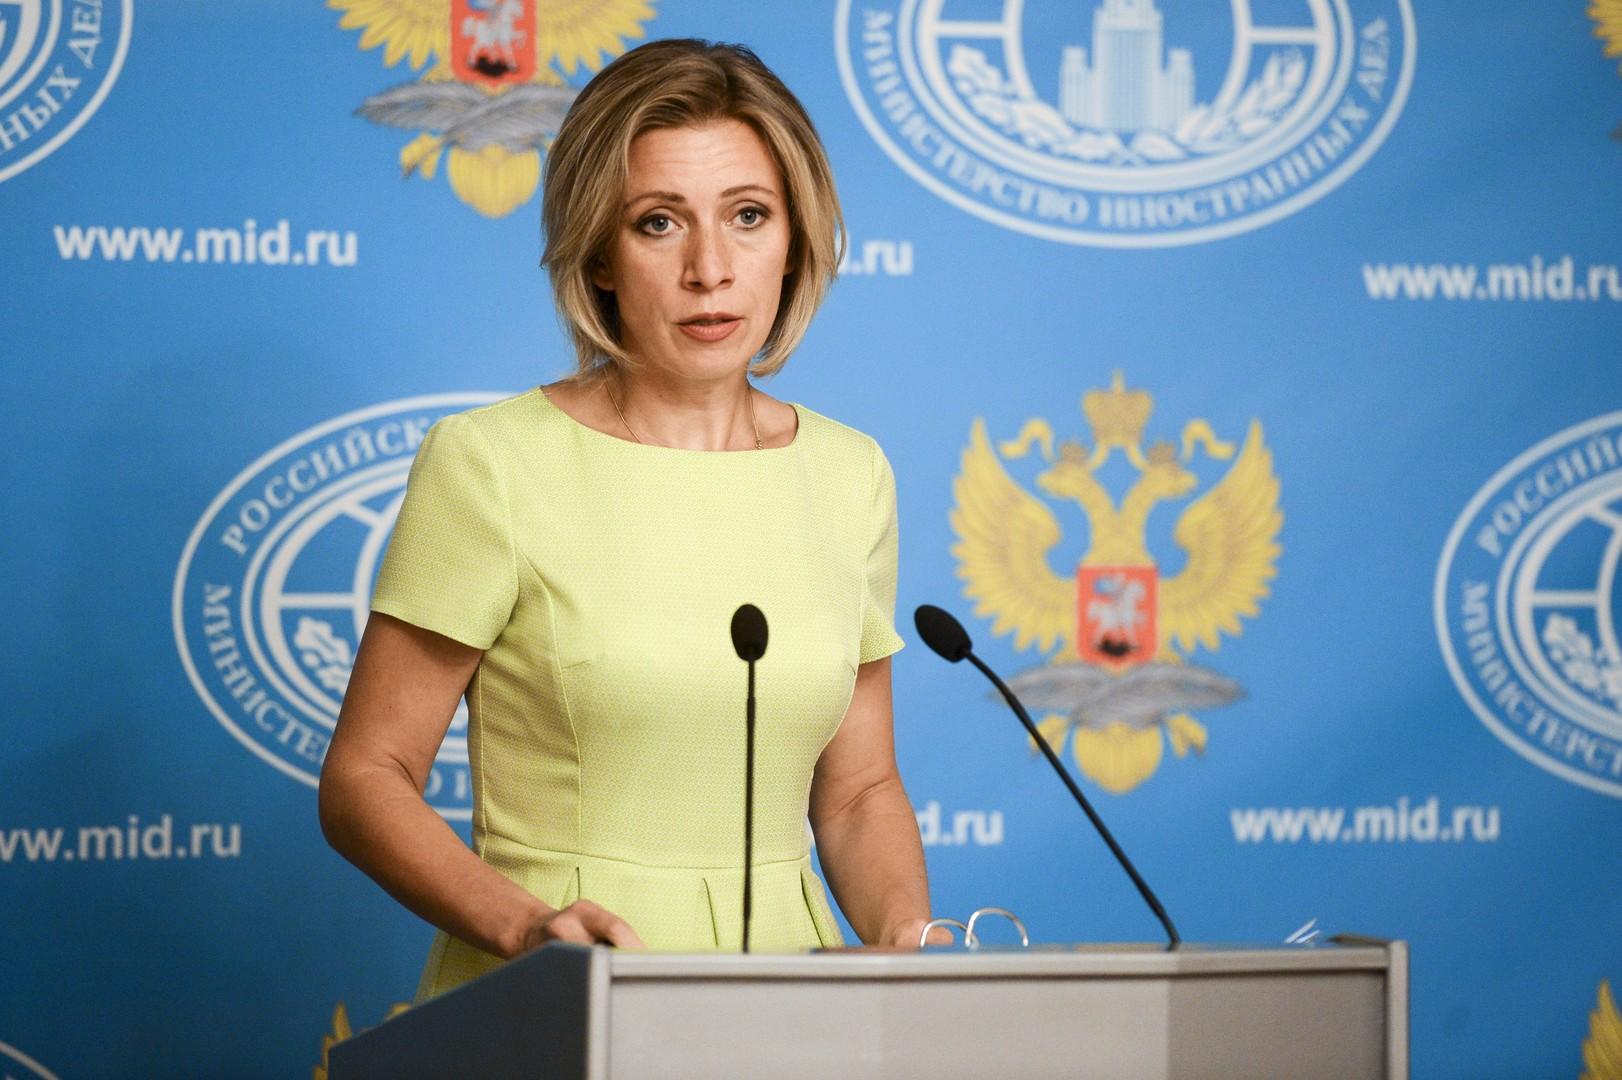 Захарова: США ведут охоту на россиян за рубежом